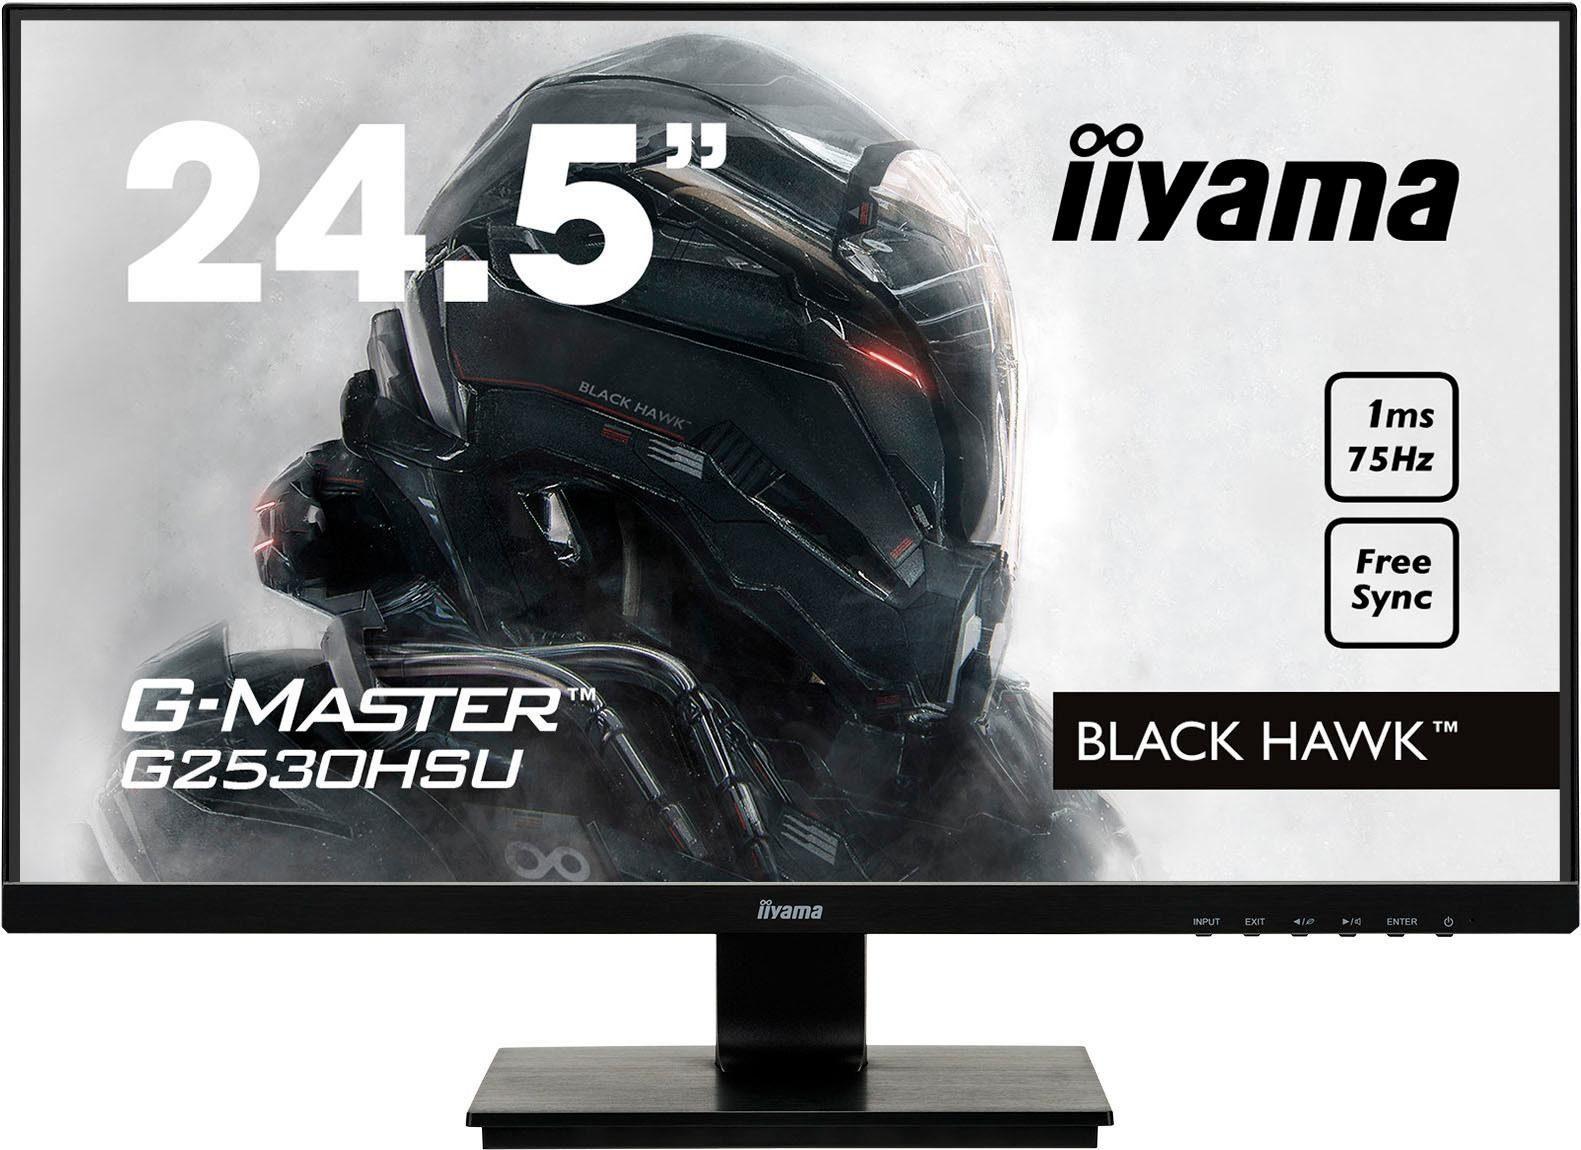 Iiyama G2530HSU-B1 Gaming-LED-Monitor (1920 x 1080 Pixel, Full HD, 1 ms Reaktionszeit, 75 Hz)